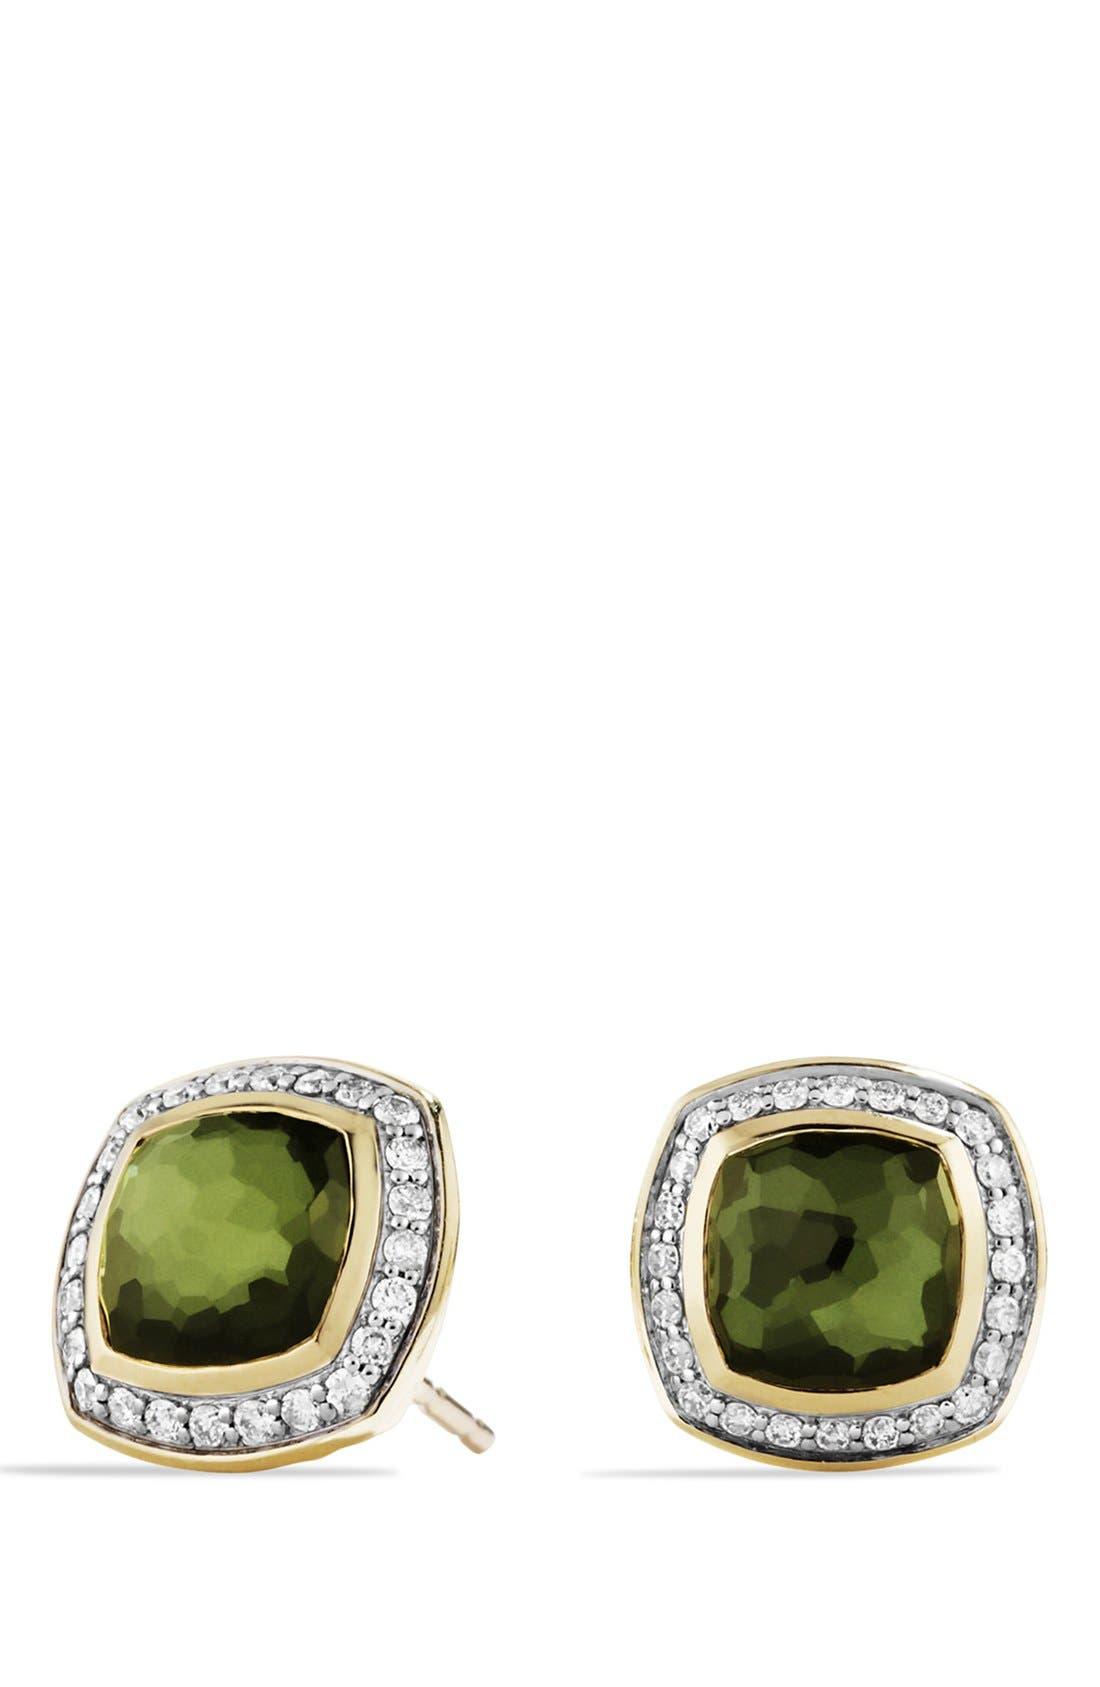 Main Image - David Yurman 'Albion' Earrings with Semiprecious Stone and Diamonds in Gold